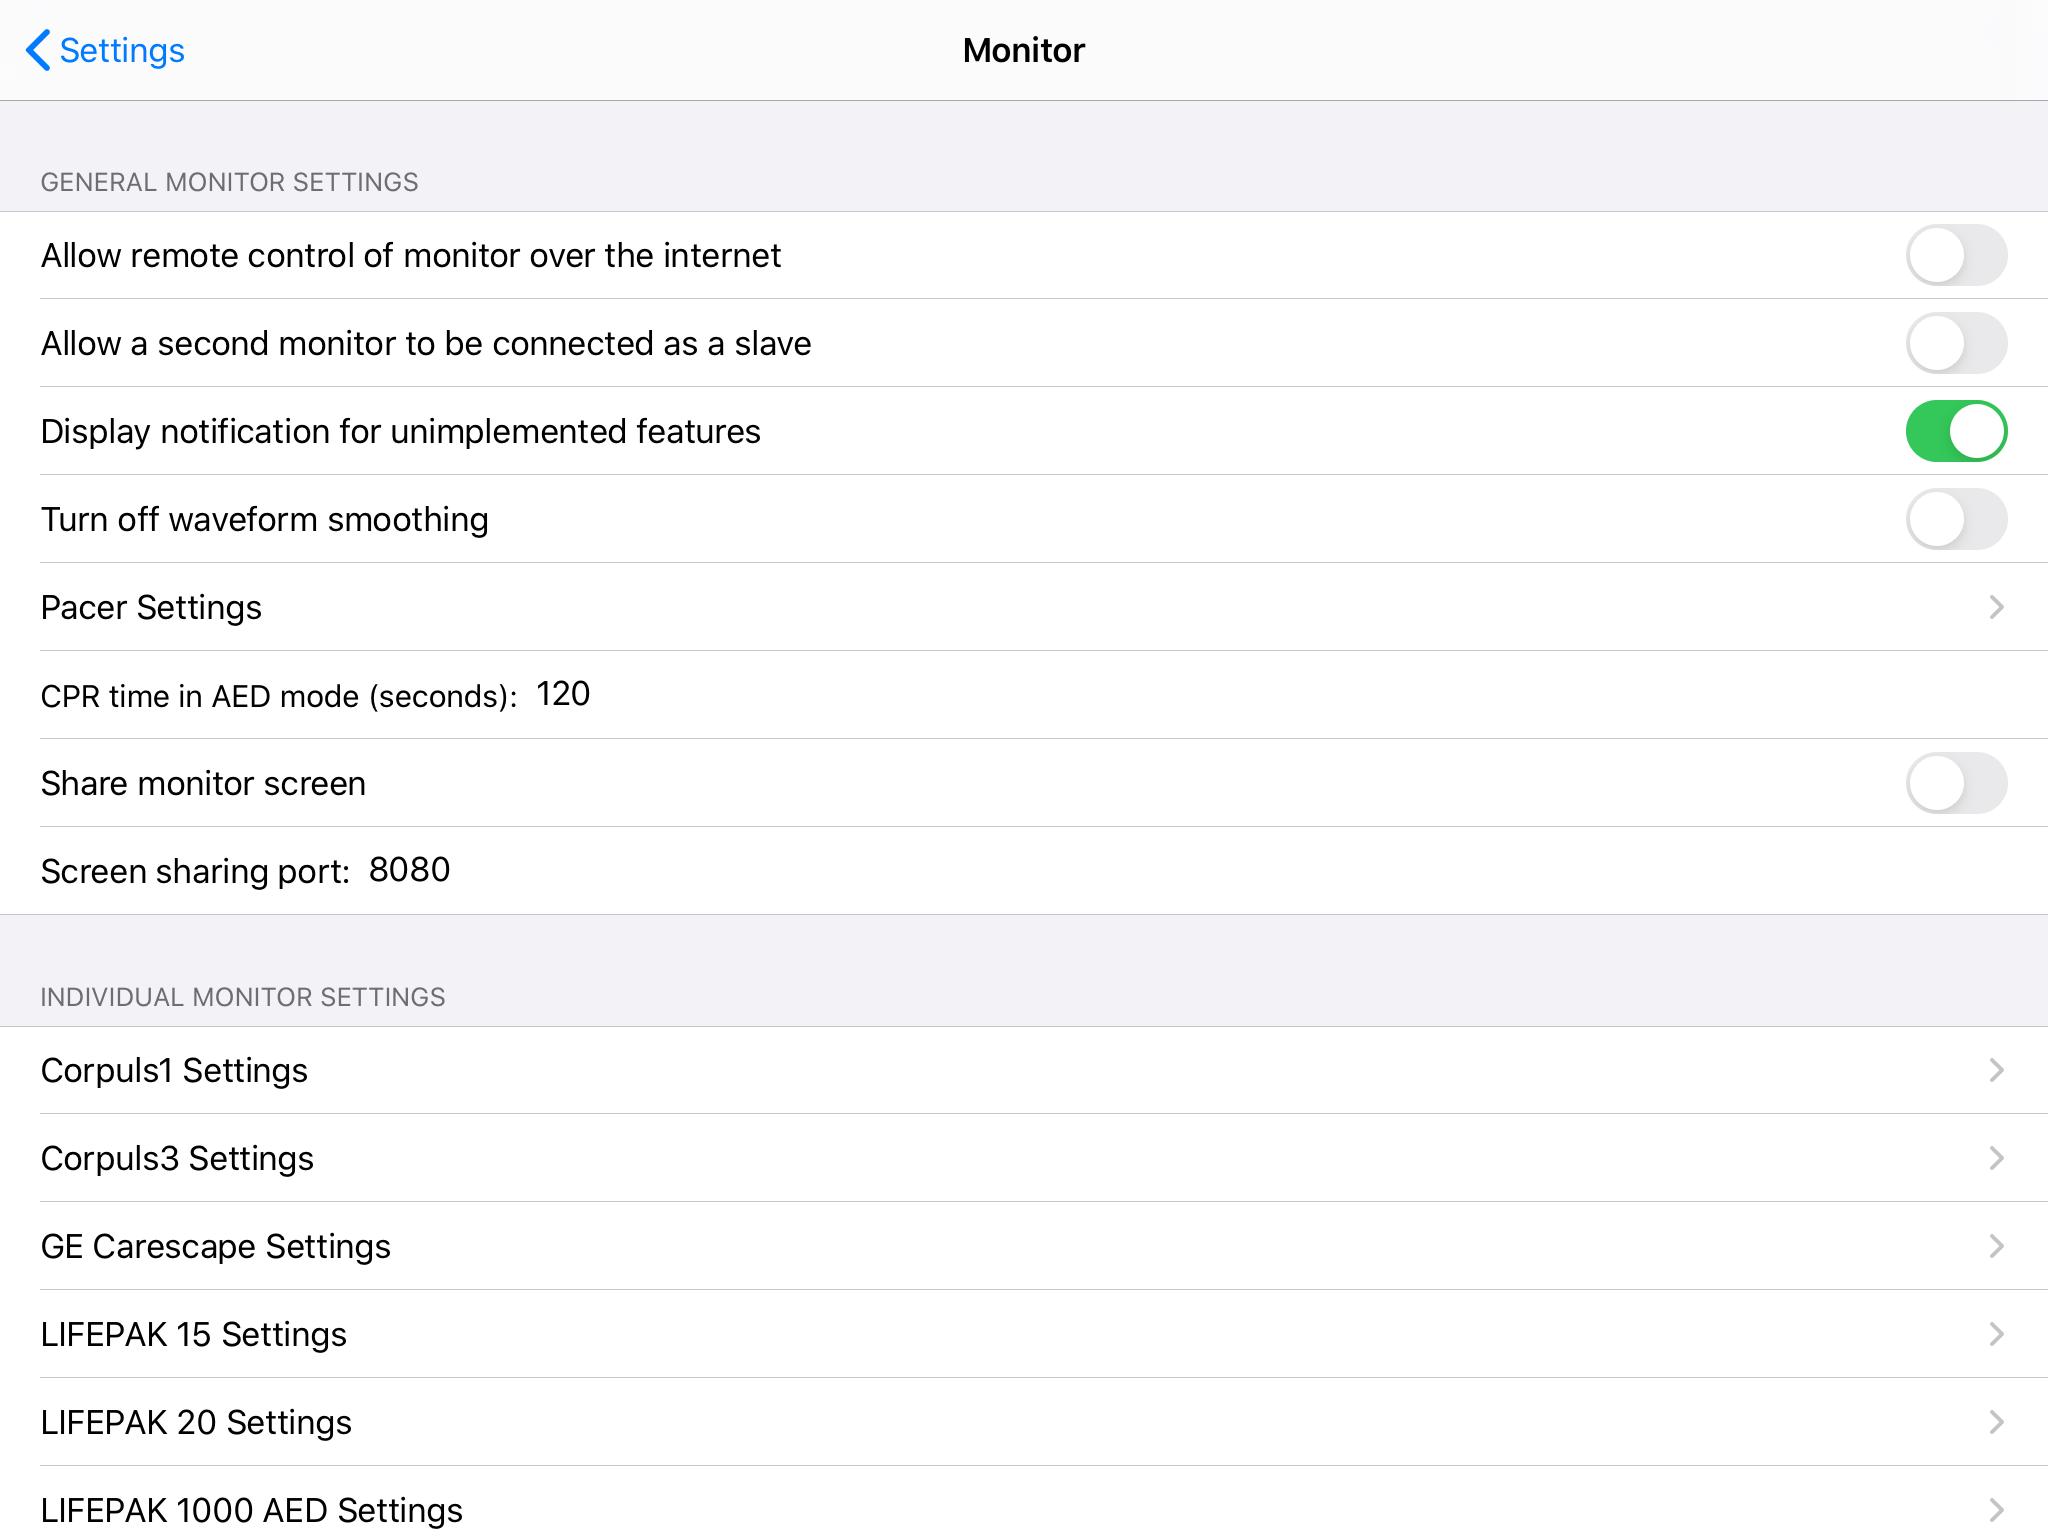 Settings_Monitor.PNG